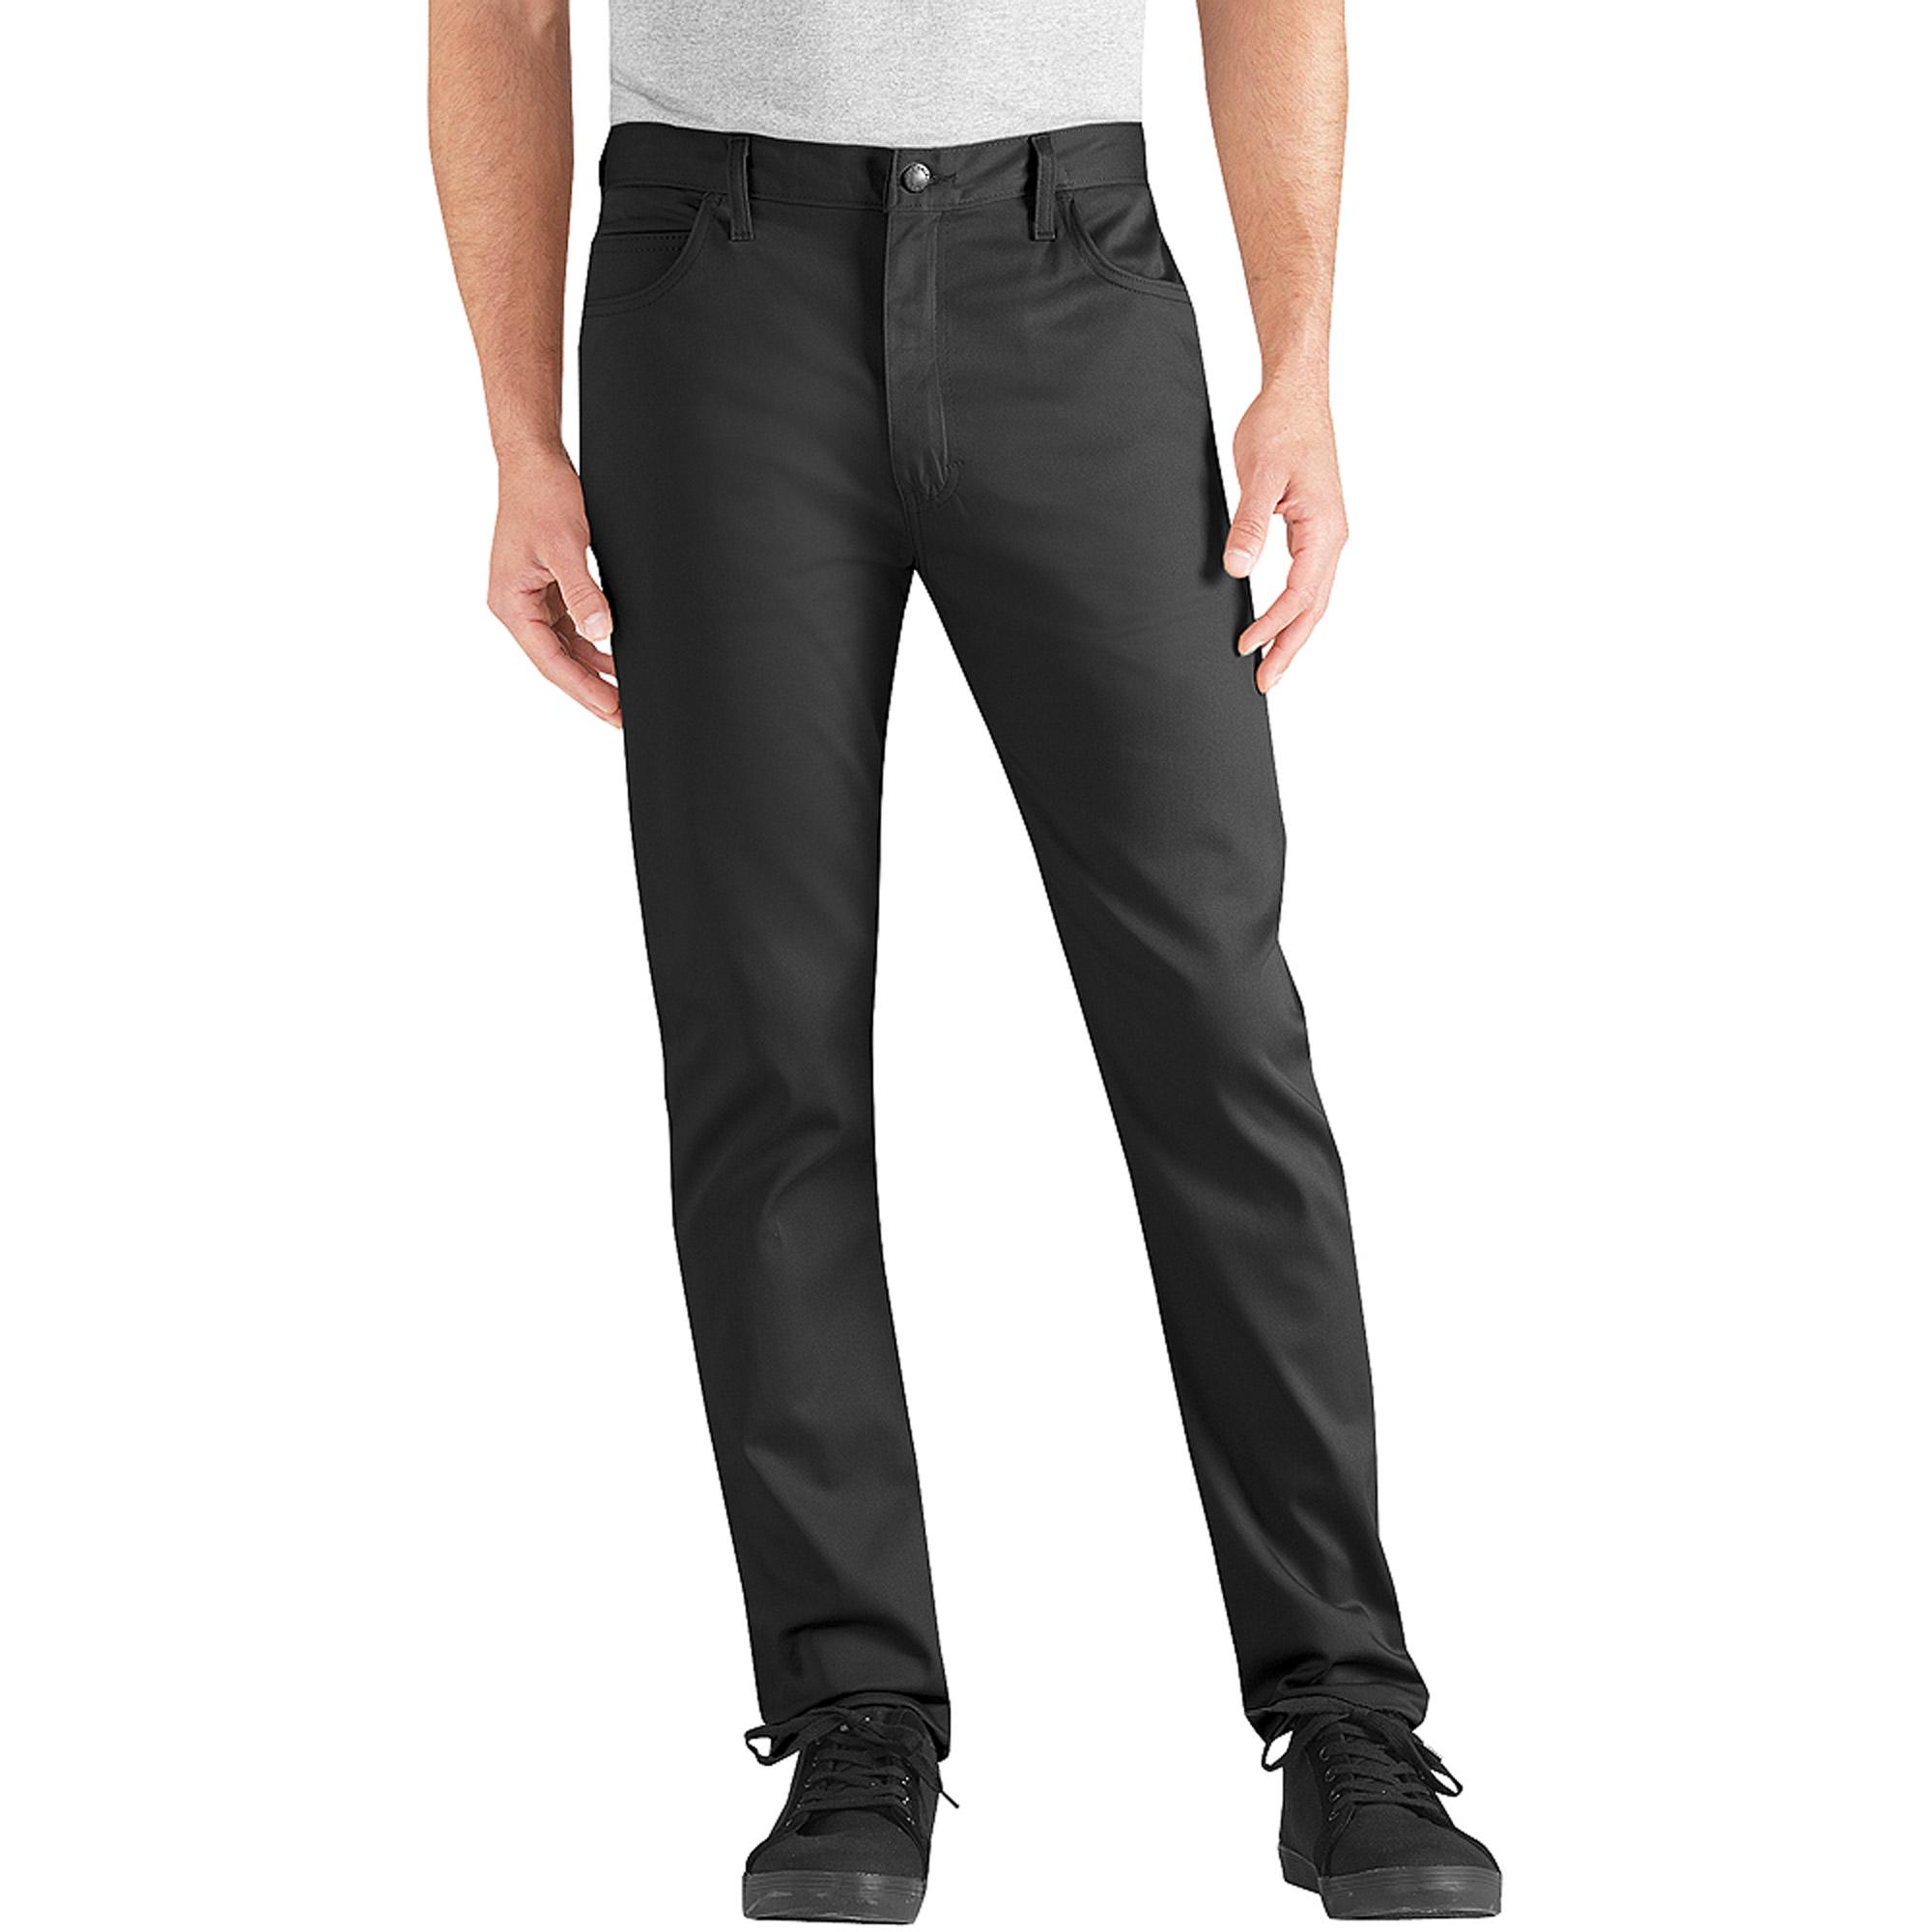 Genuine Dickies Men's Slim Flat Fit 5 Pocket Twill Pant